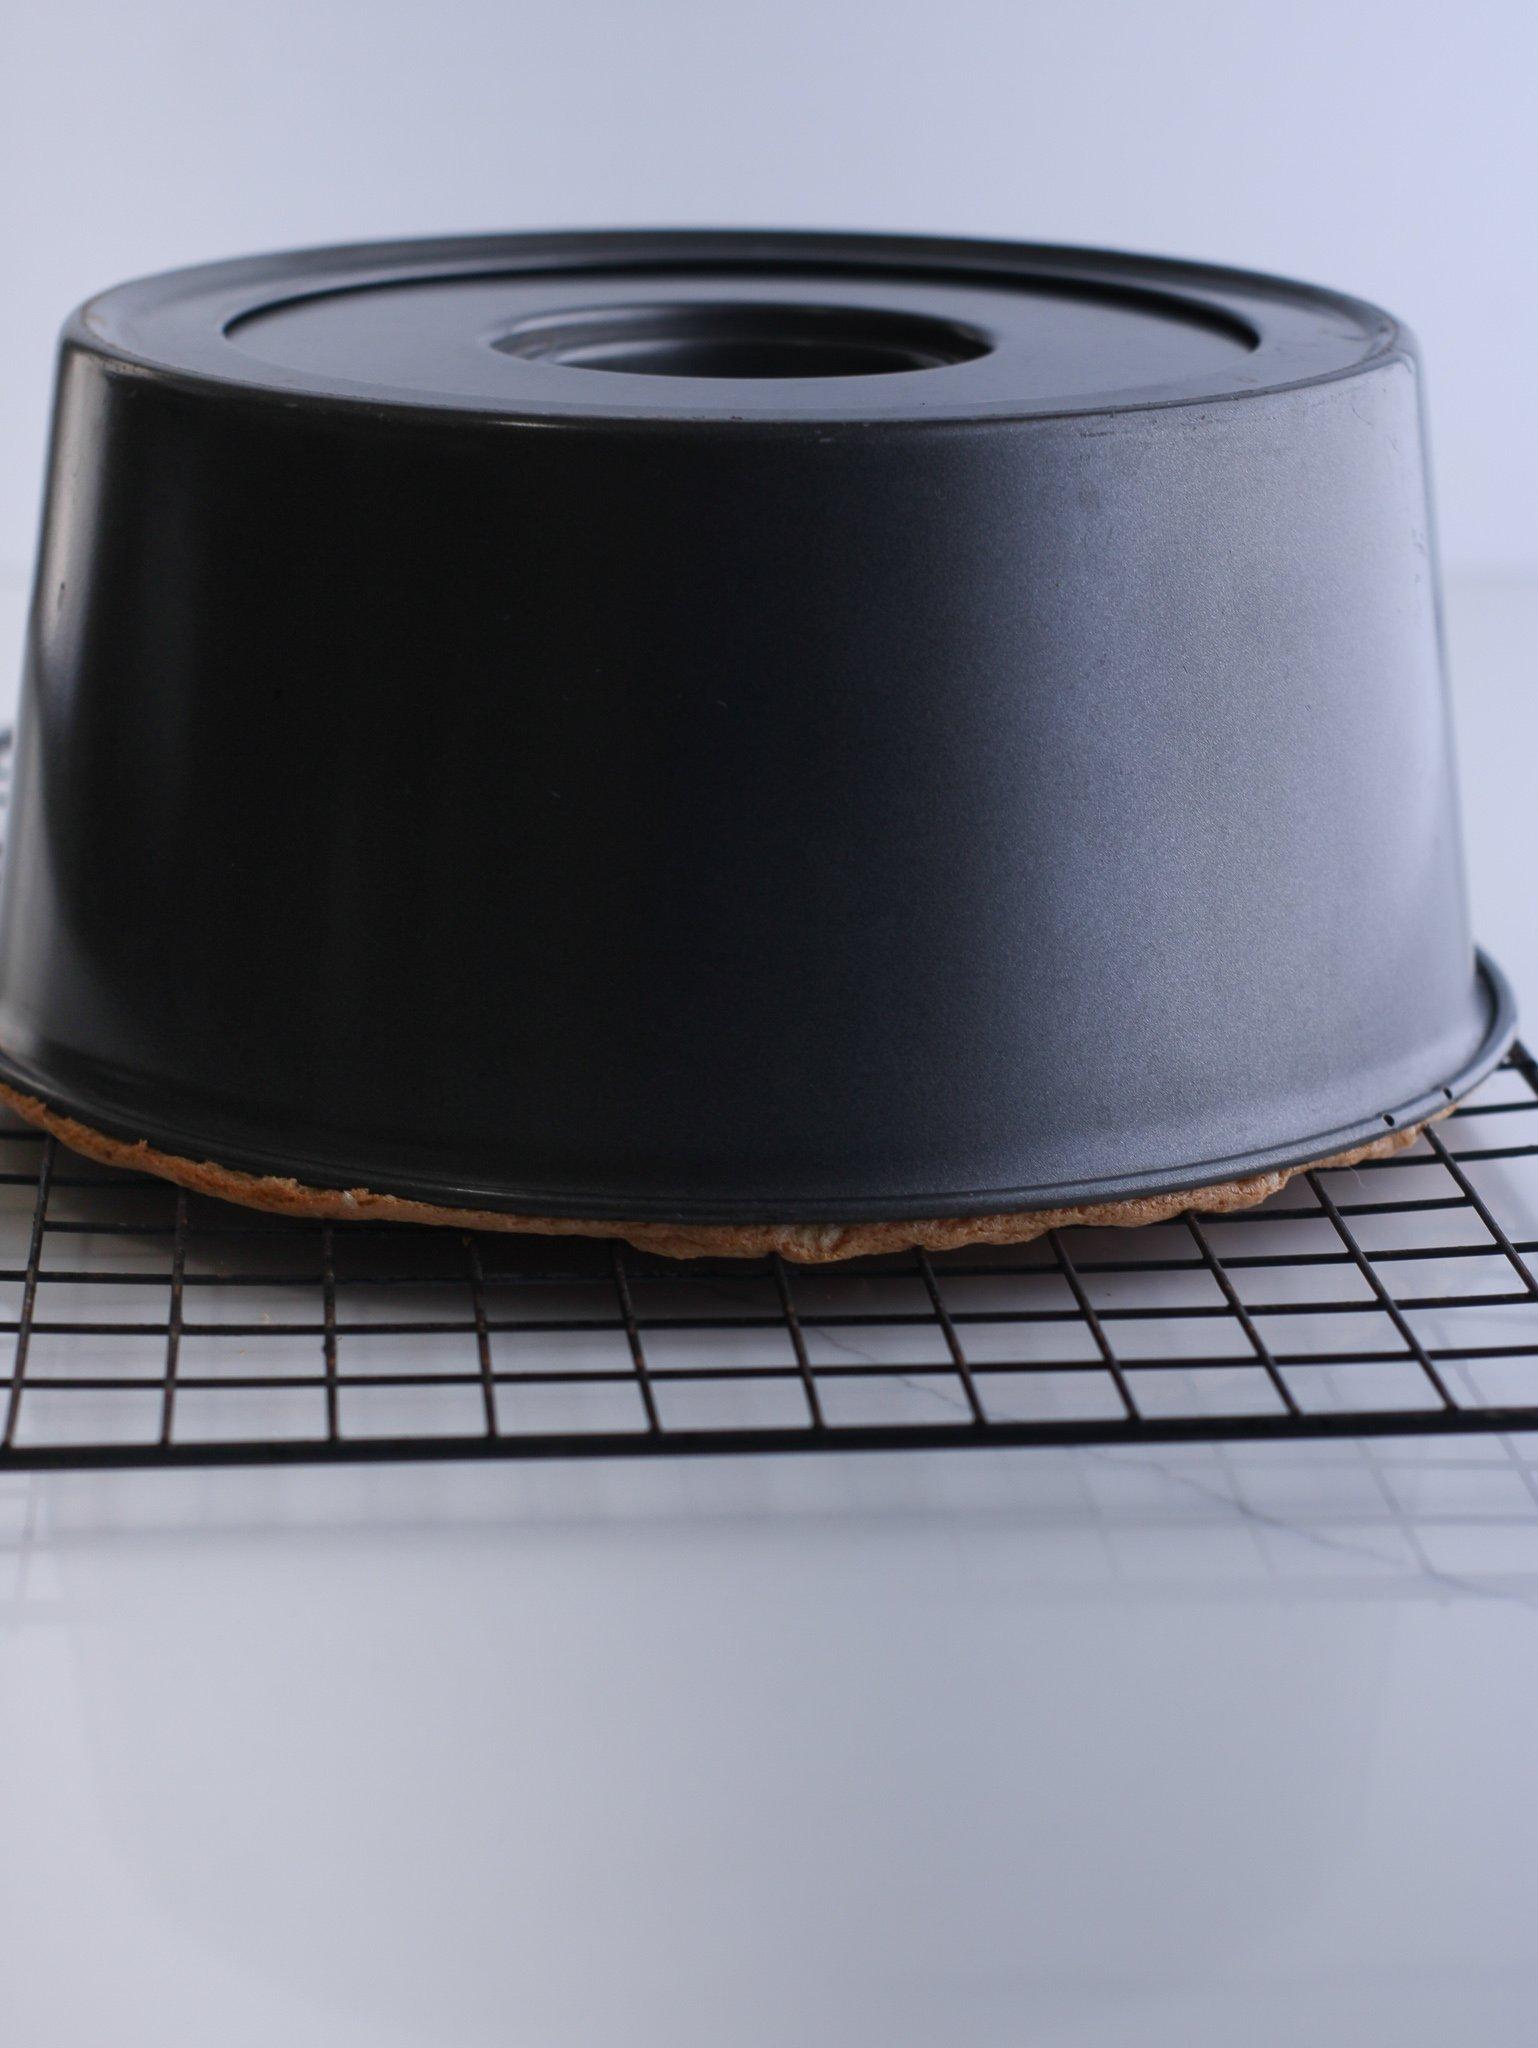 Angel food cake cooling upside down on a metal cooling rack.